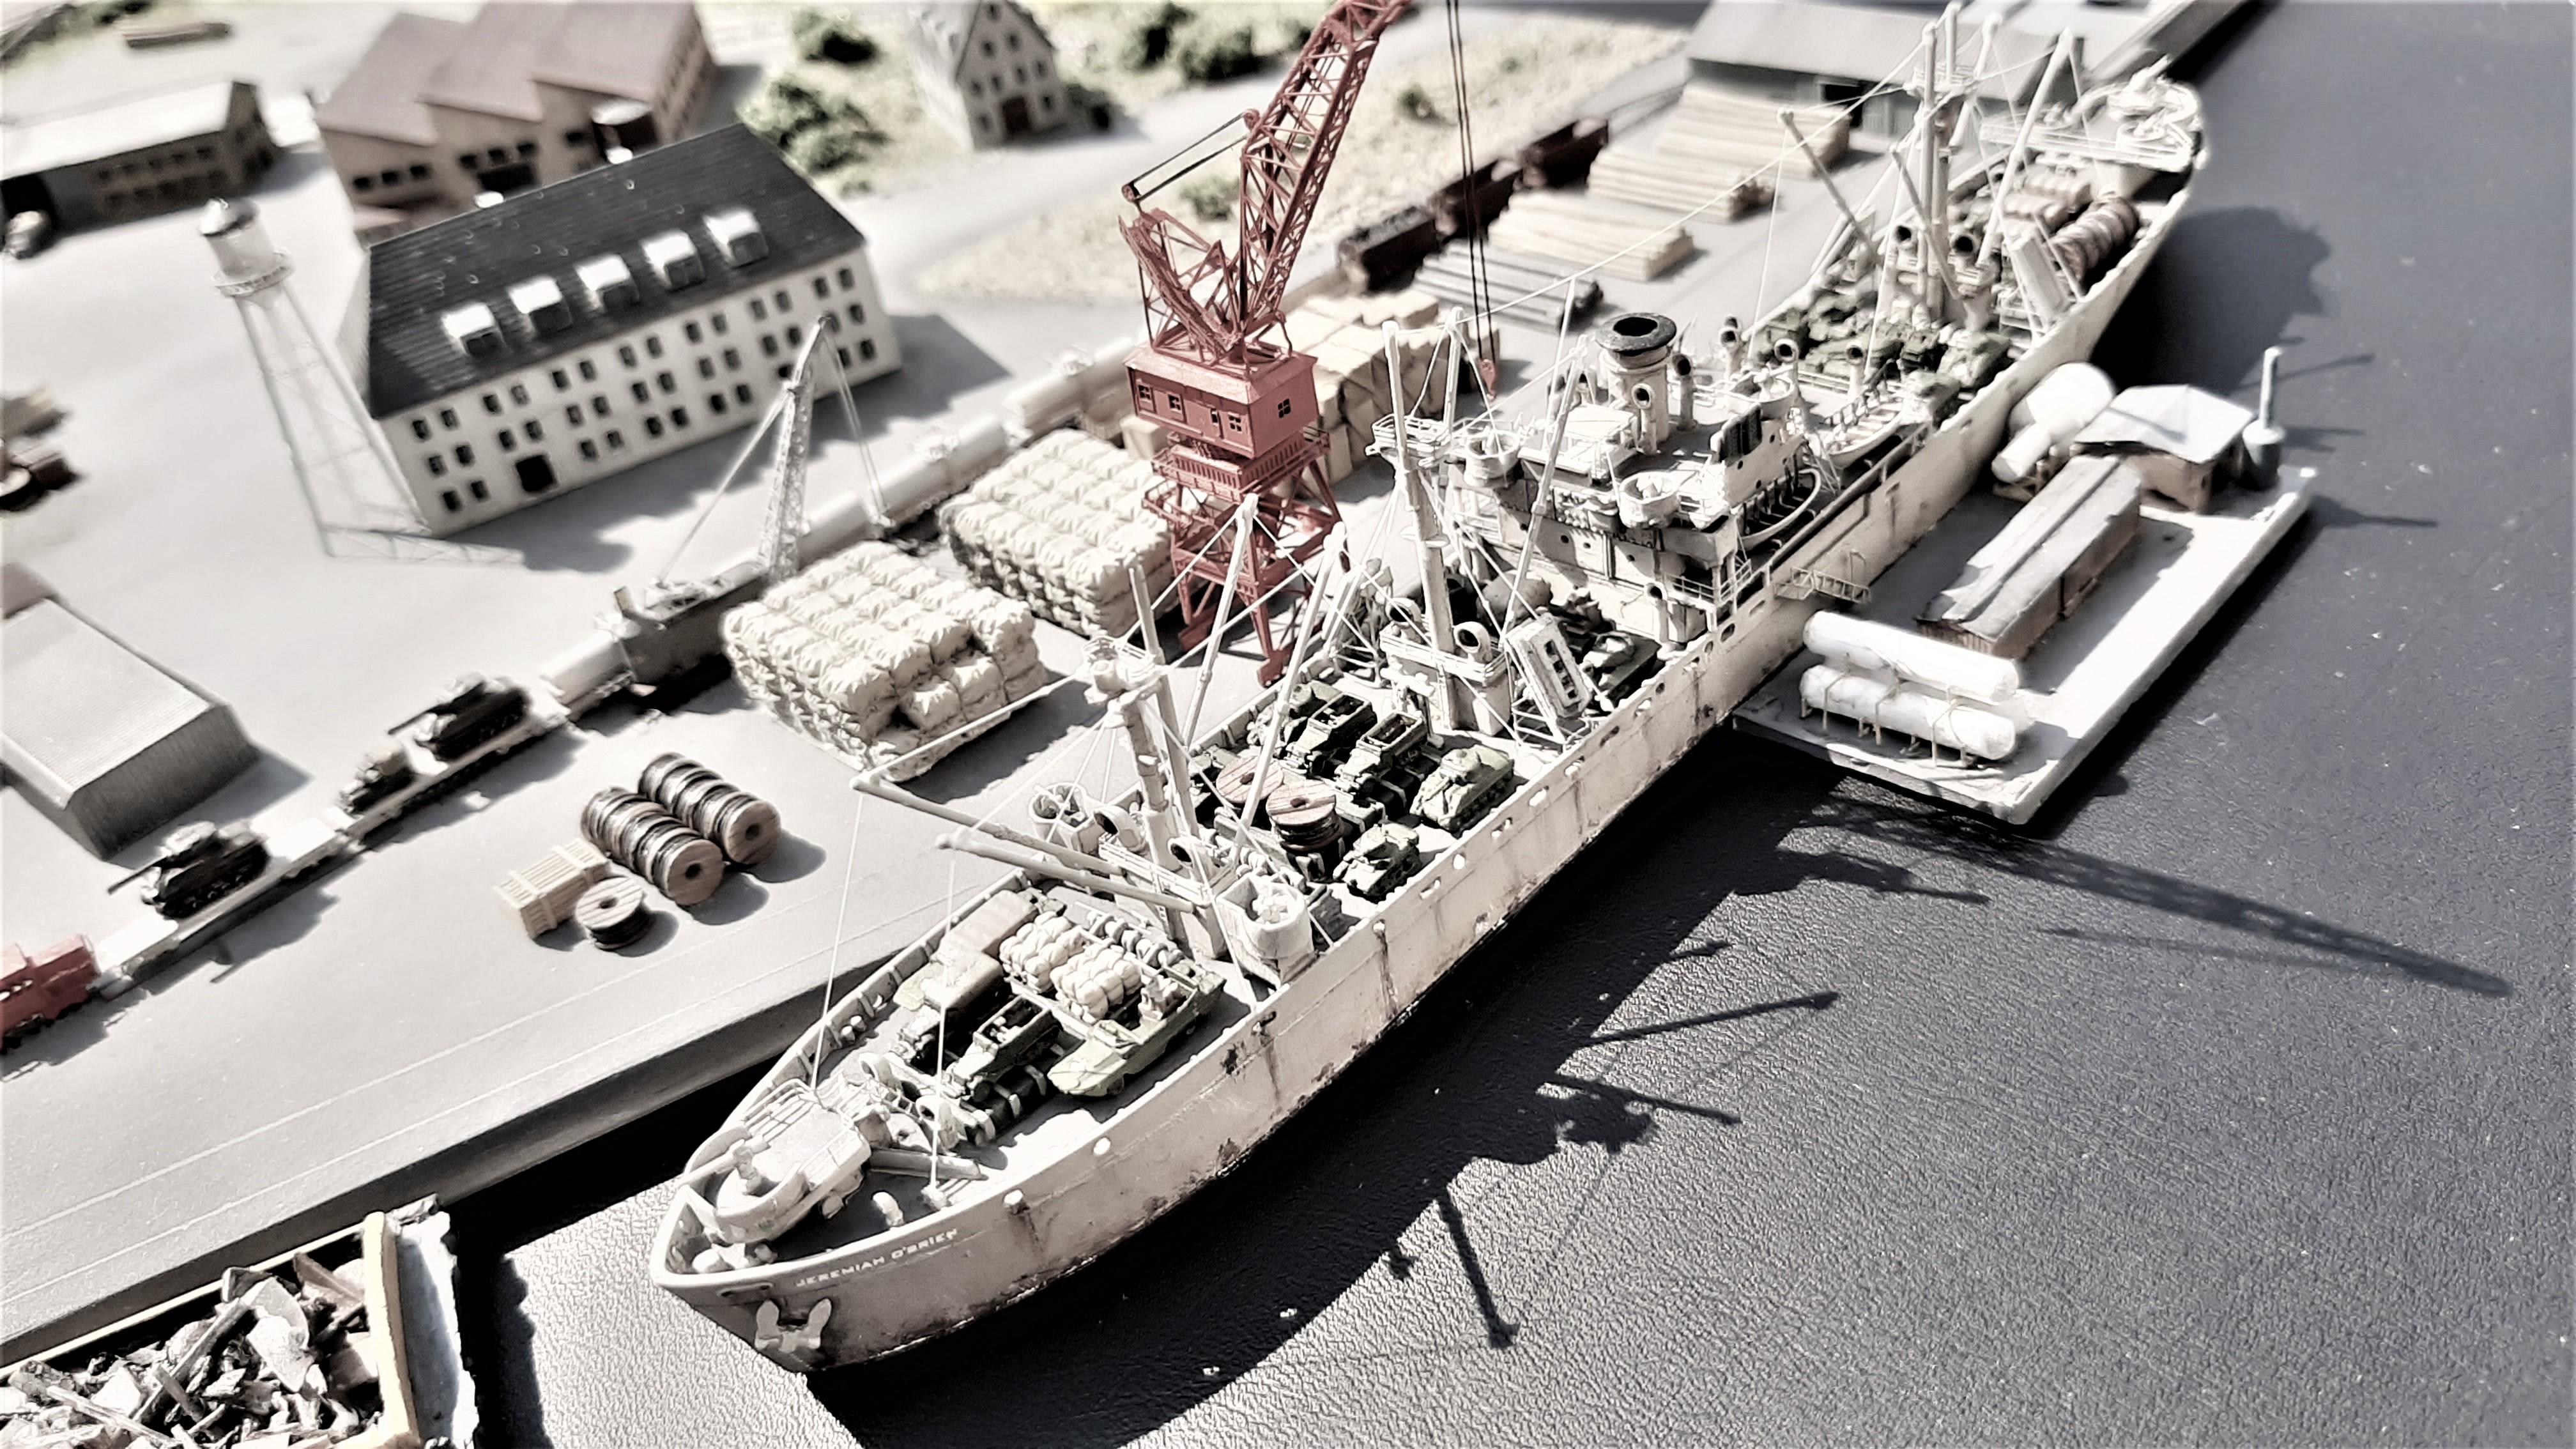 Liberty ship Jeremiah O'Brien 1/700 Trumpeter  Q2xTSEnwz